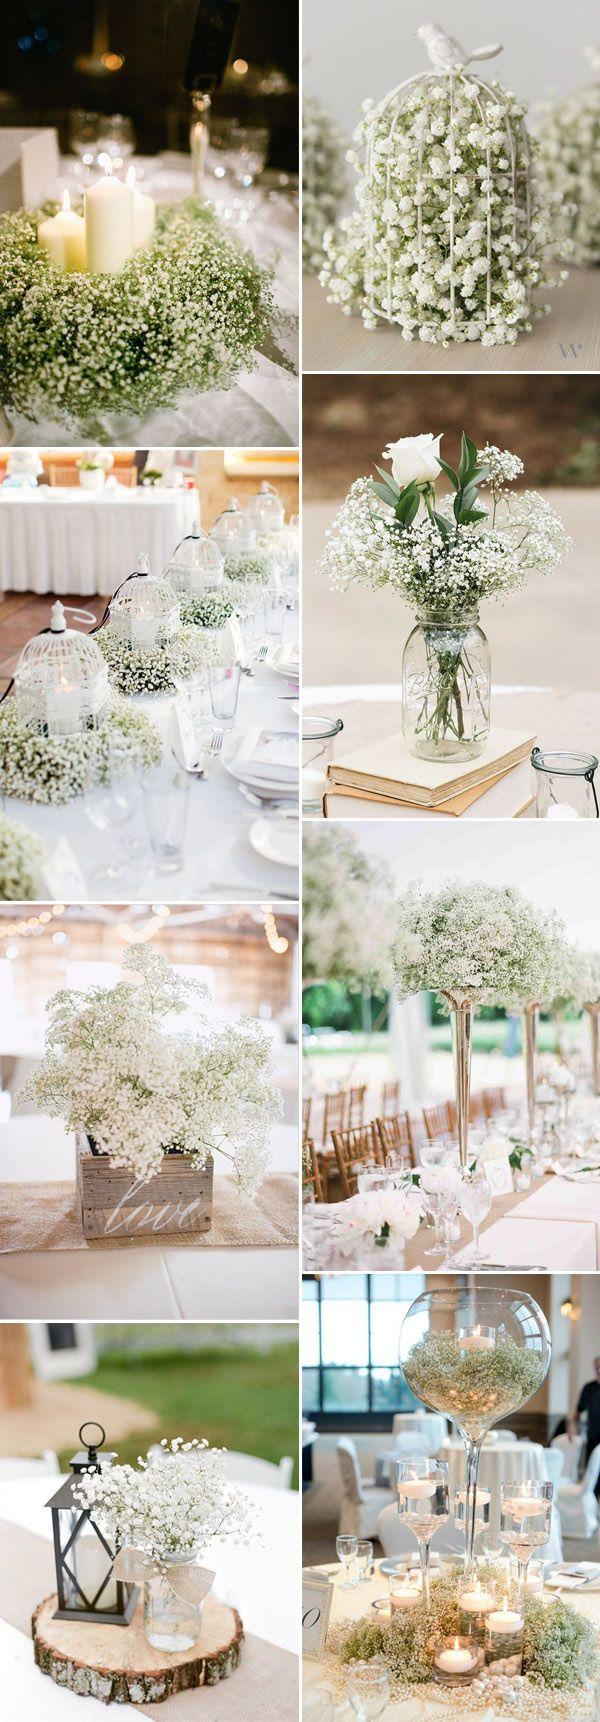 save your budget on weddings with 45 babyu0027s breath ideas